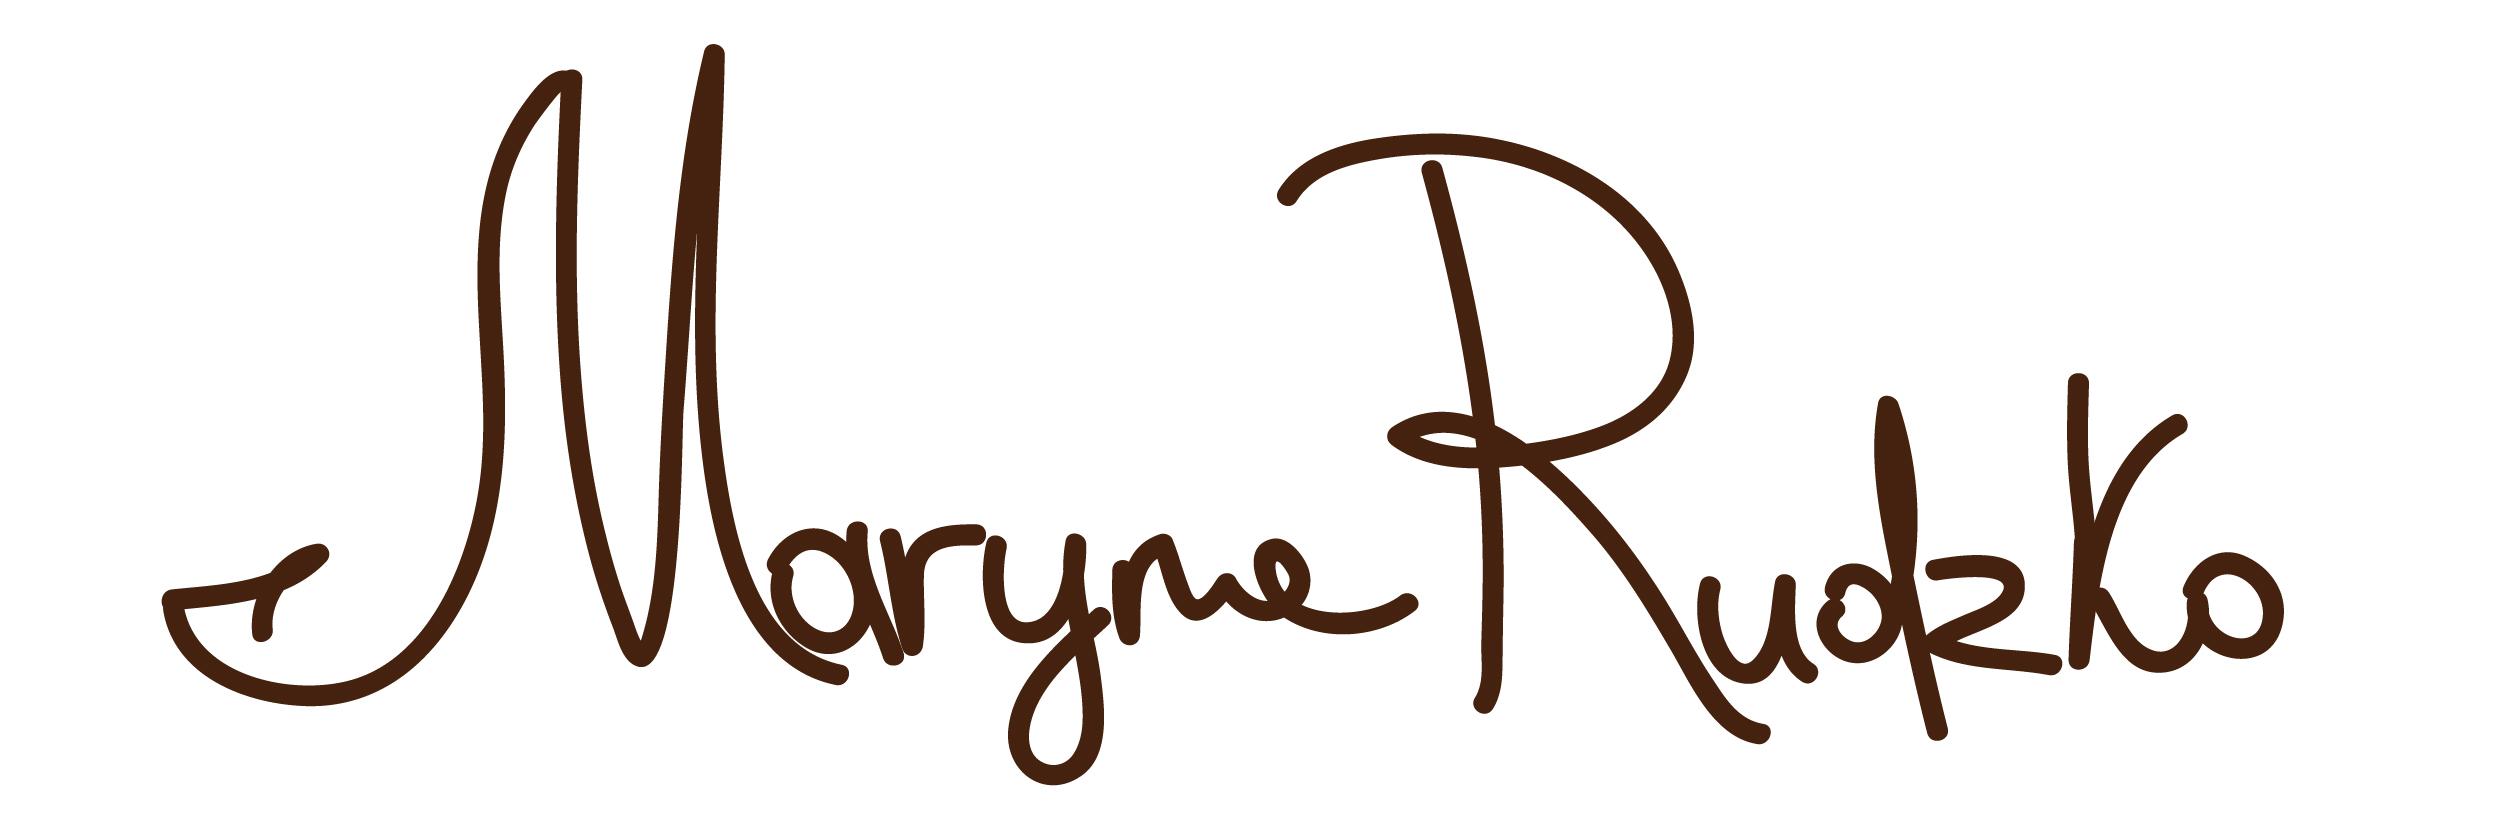 Maryna Rudzko Signature